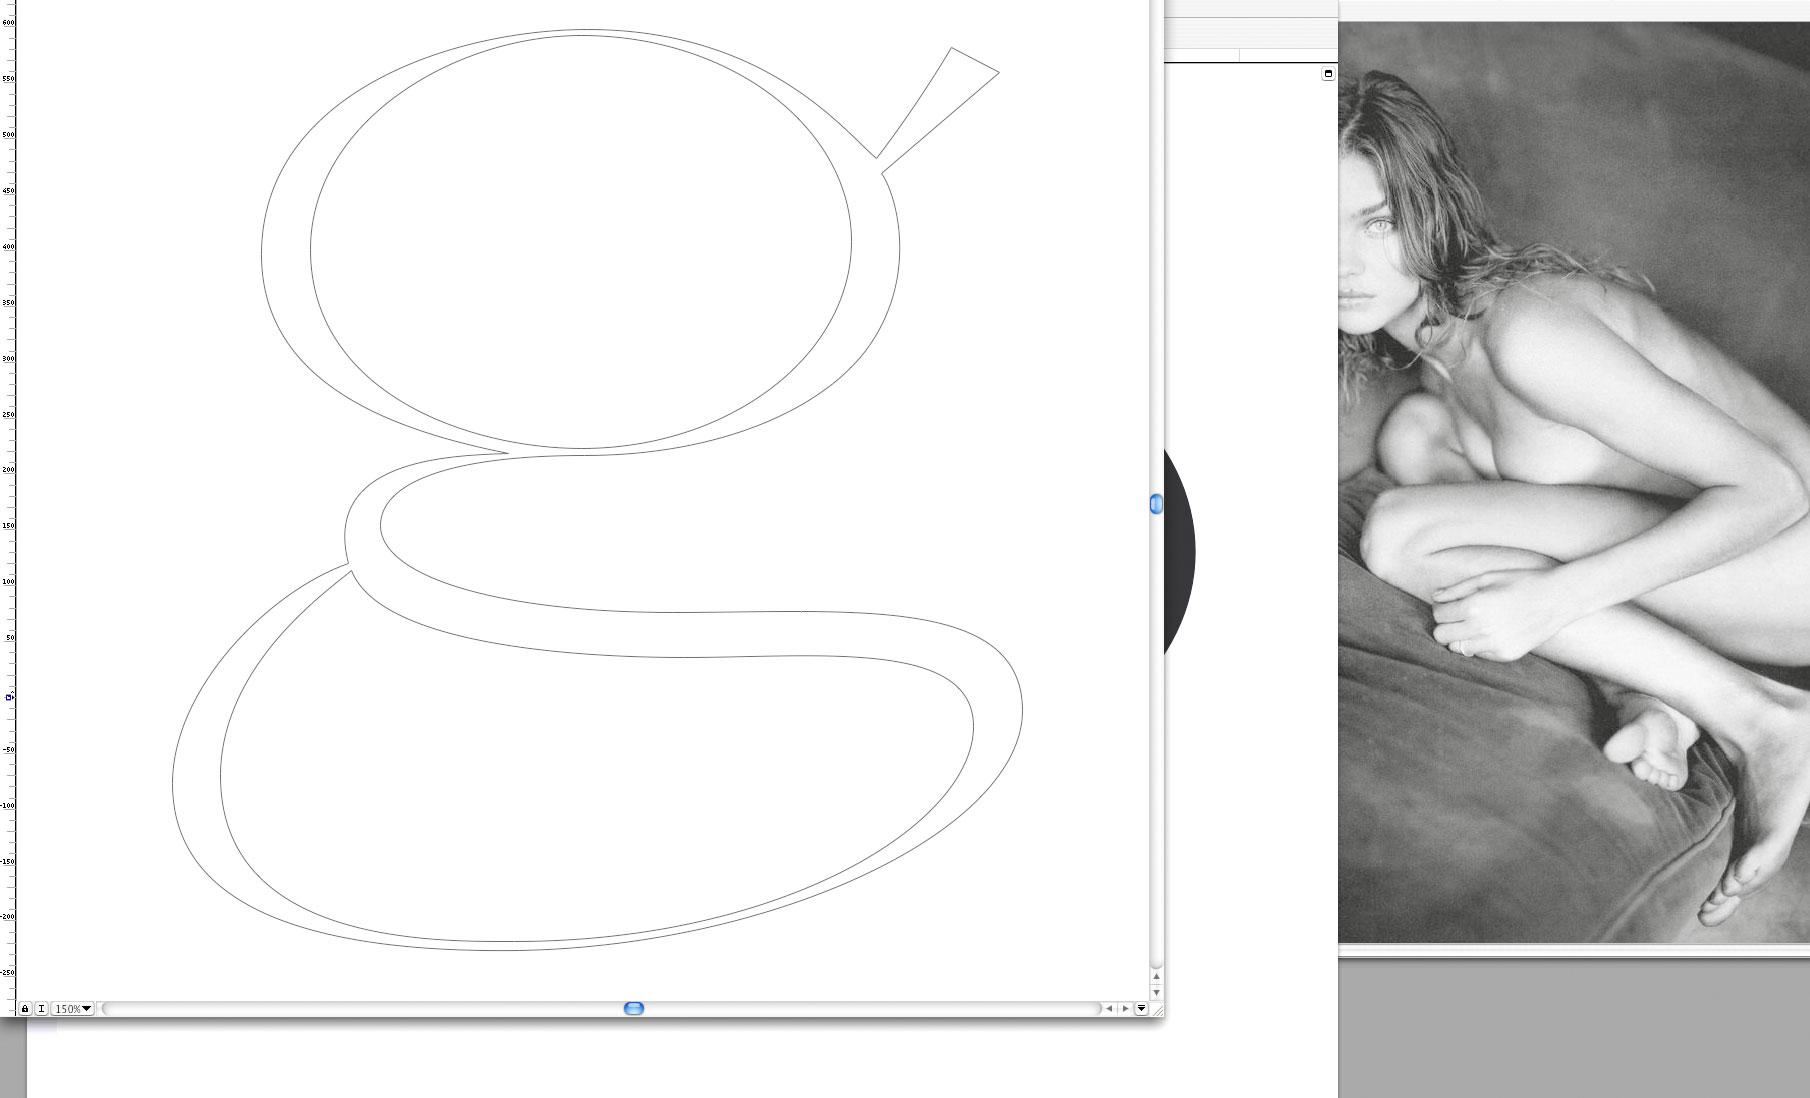 Girl 'g' · Screenshot During Drawing Process